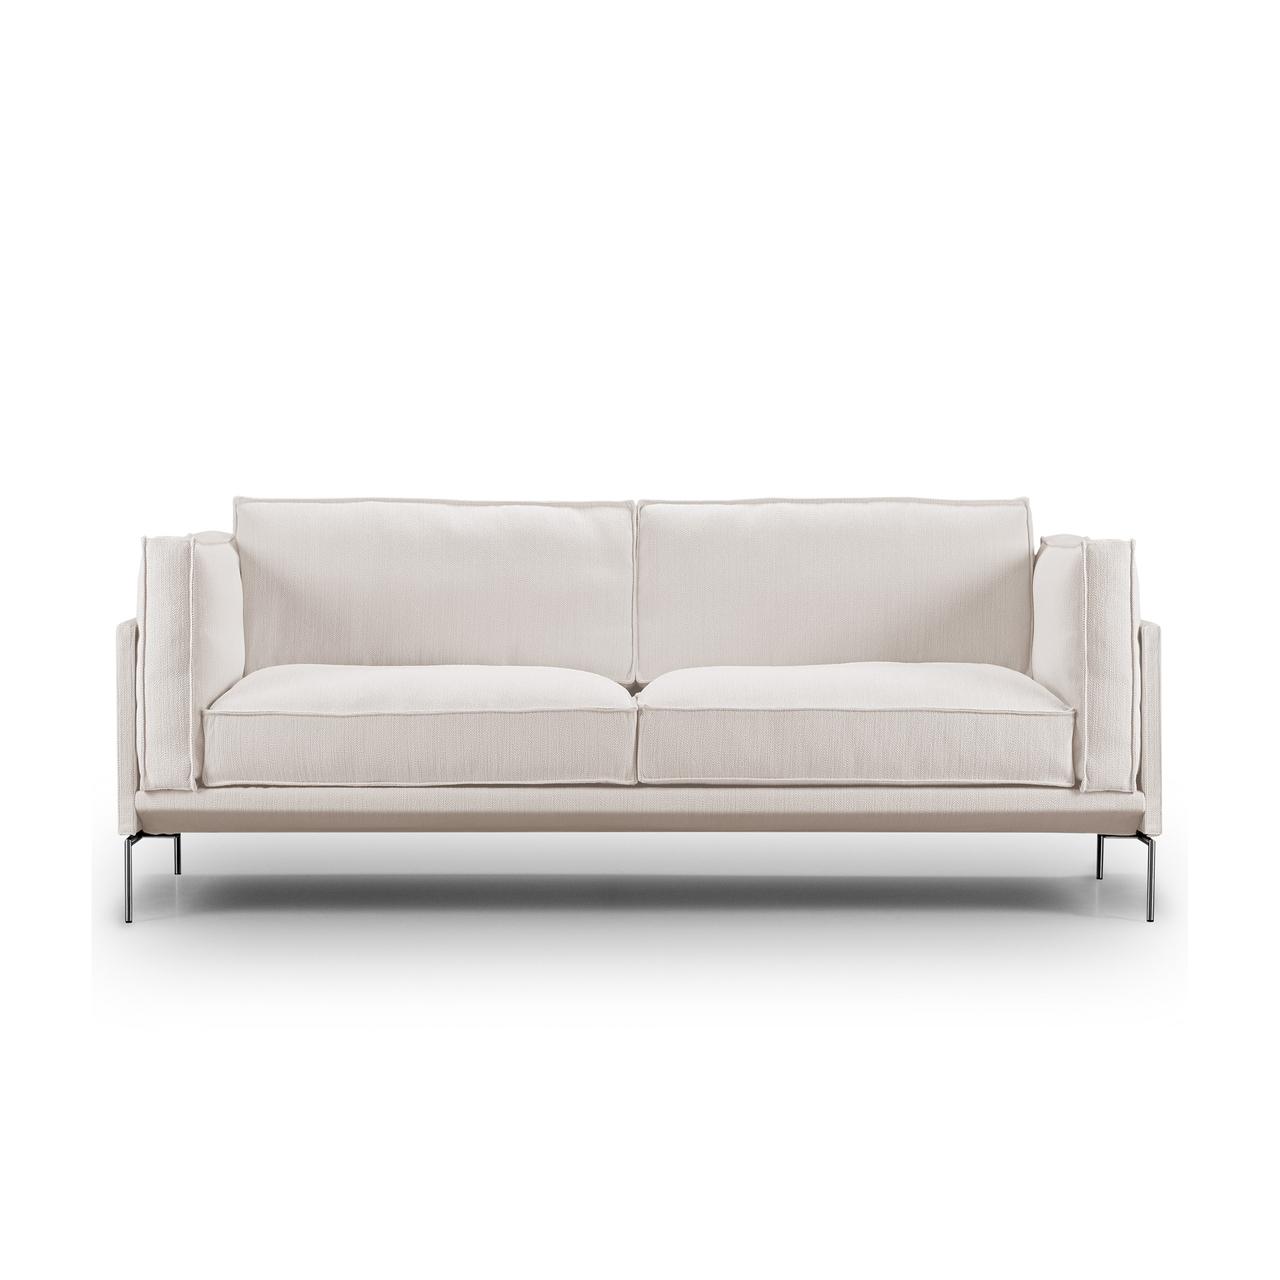 Eilersen Sofa 'Slimline' Hellgrau 20 - Gravel, B: 180 cm , Gebürsteter Edelstahl